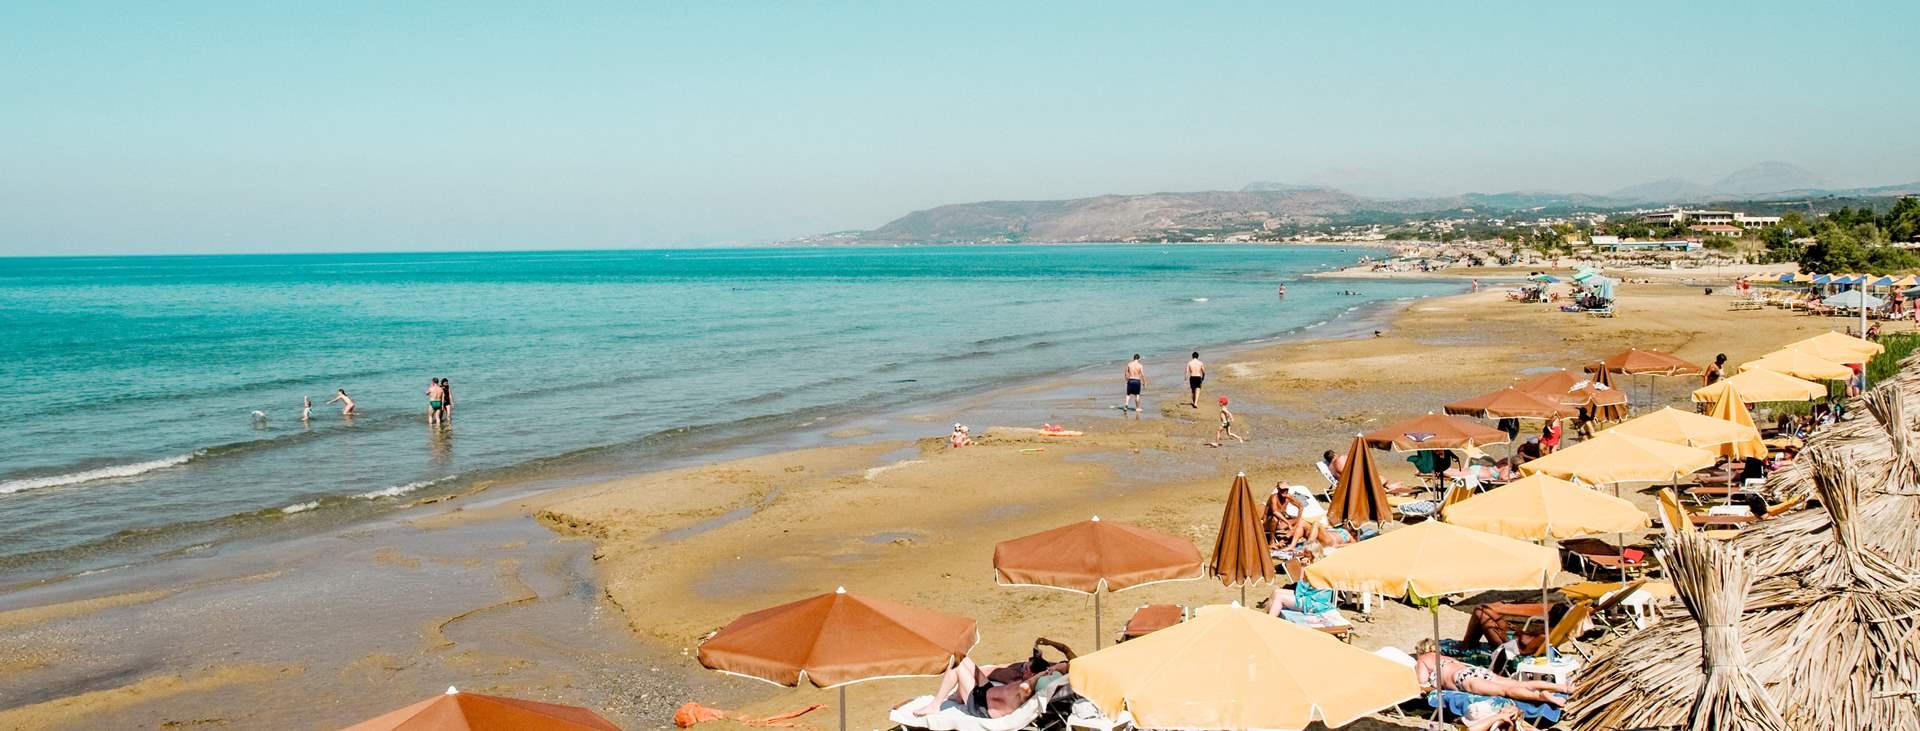 Resor till Georgioupolis i Grekland